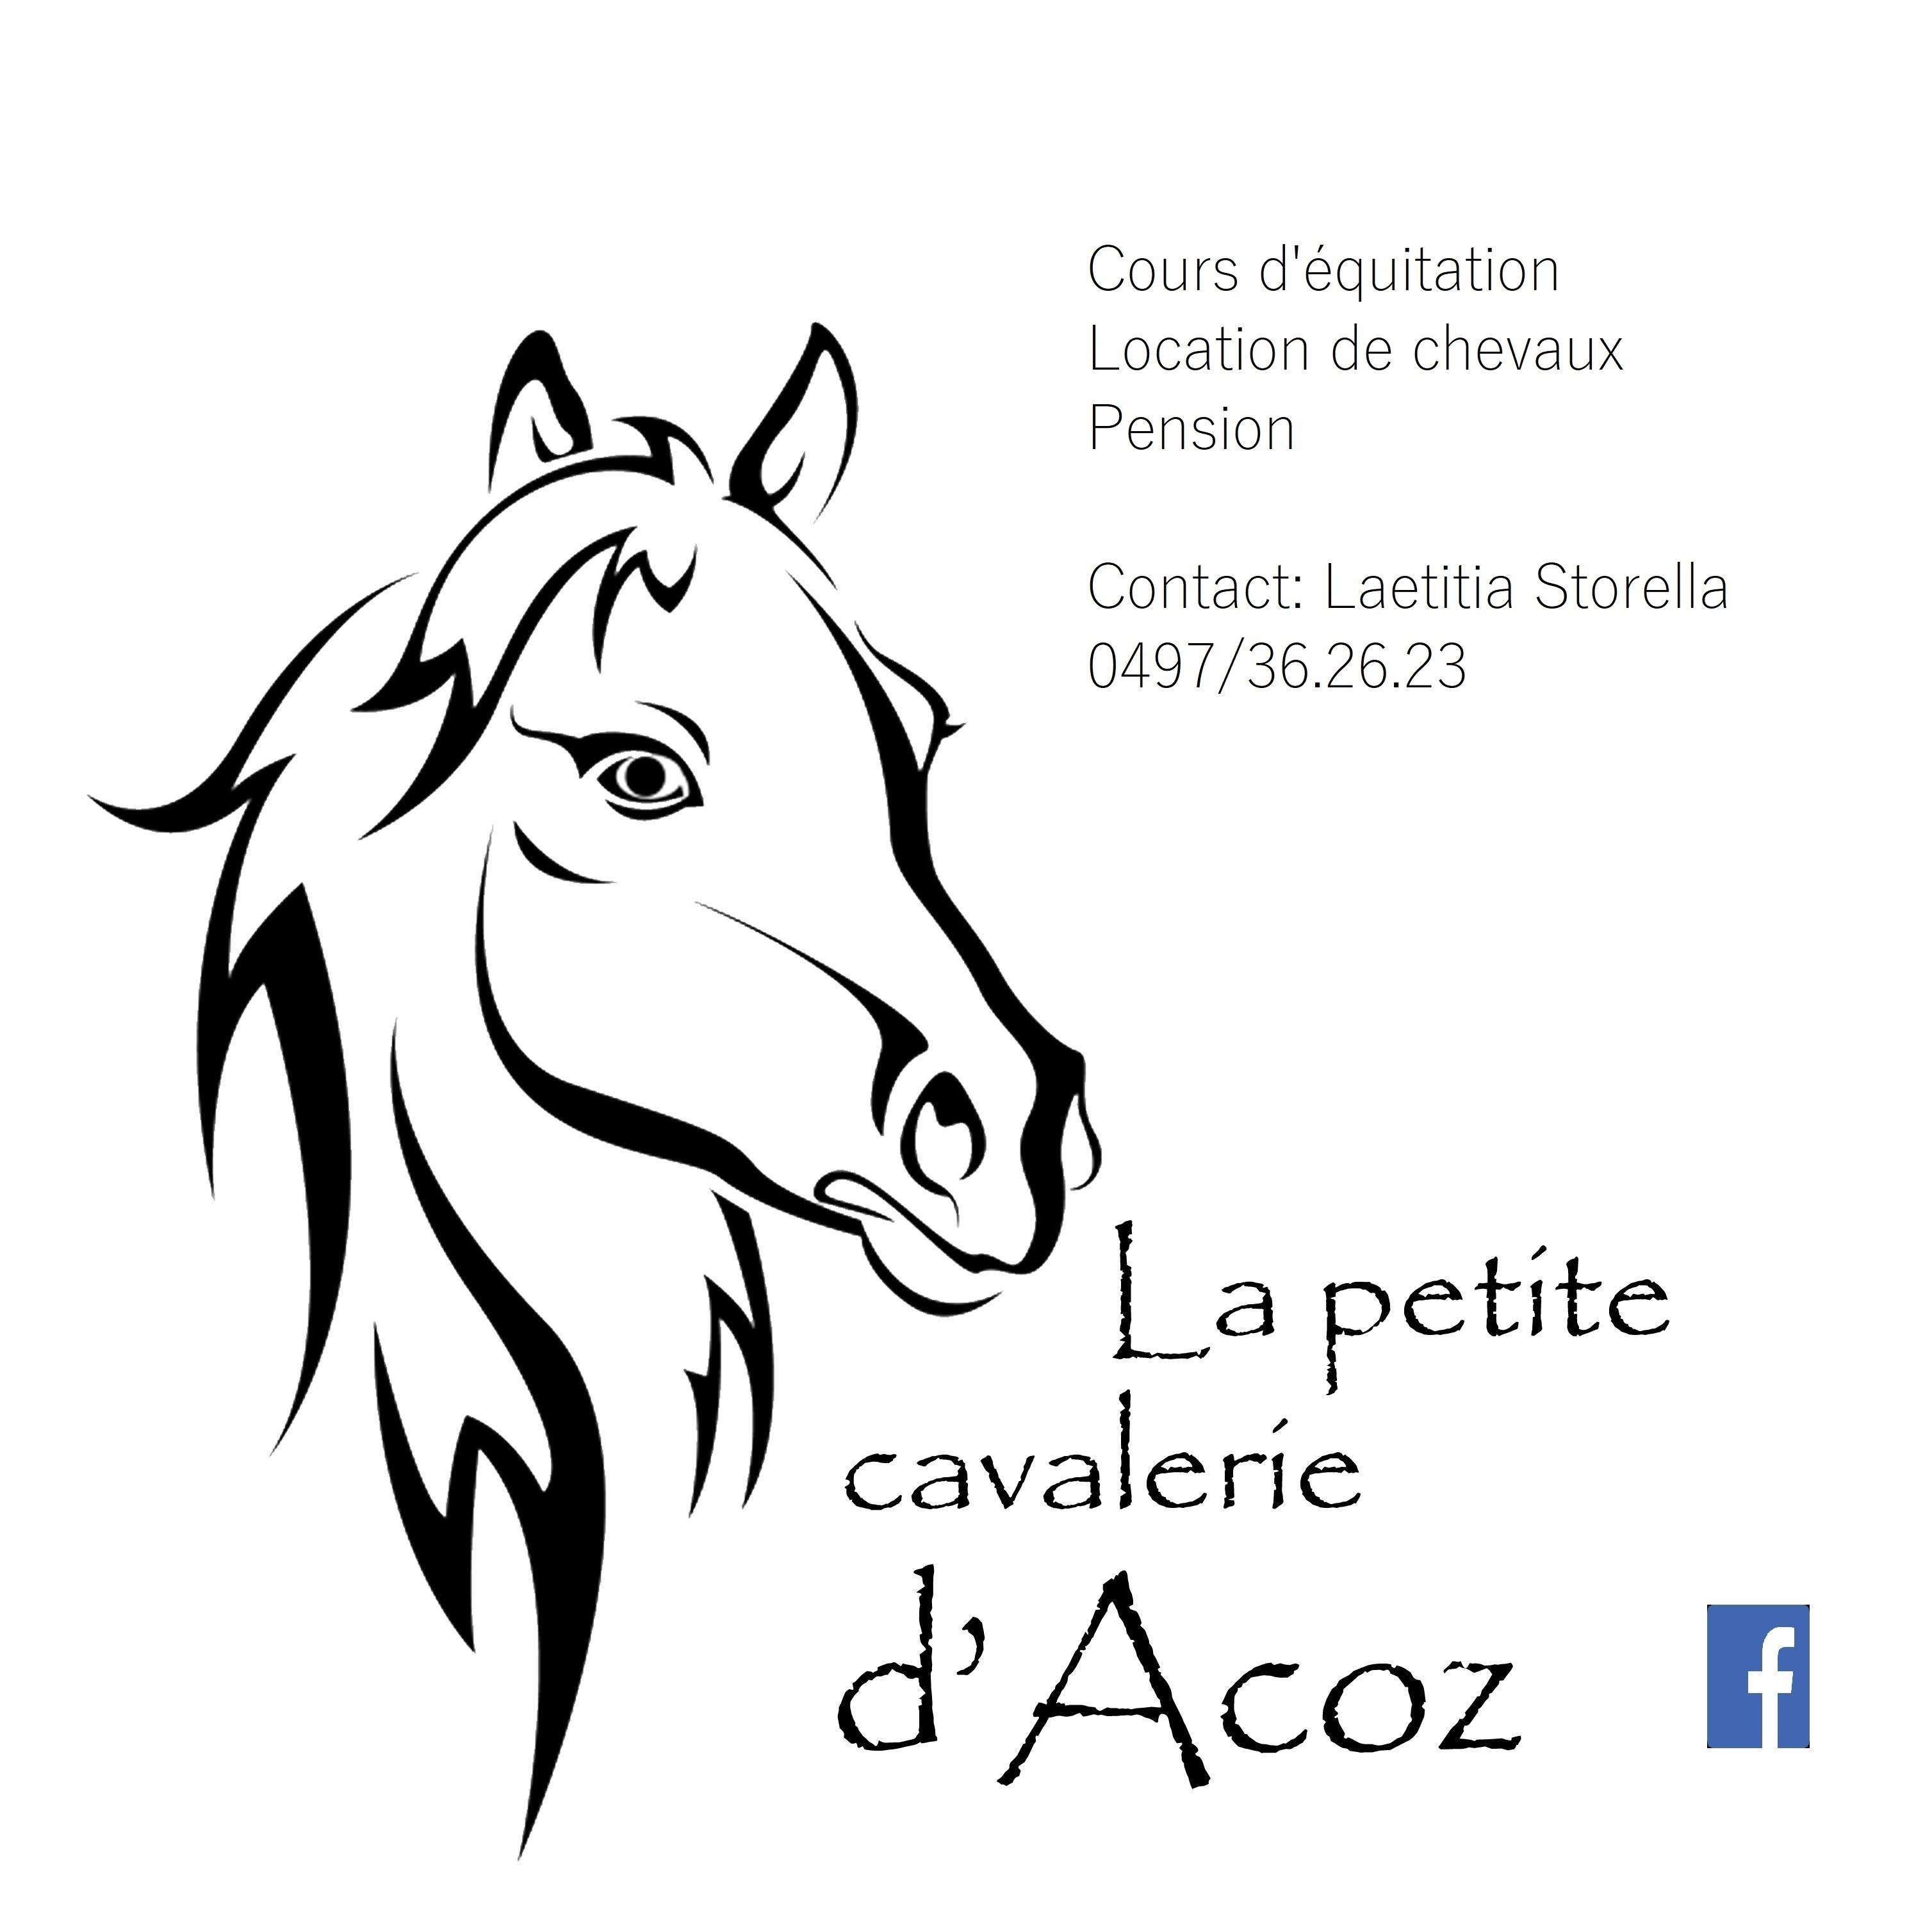 La petite cavalerie d'Acoz